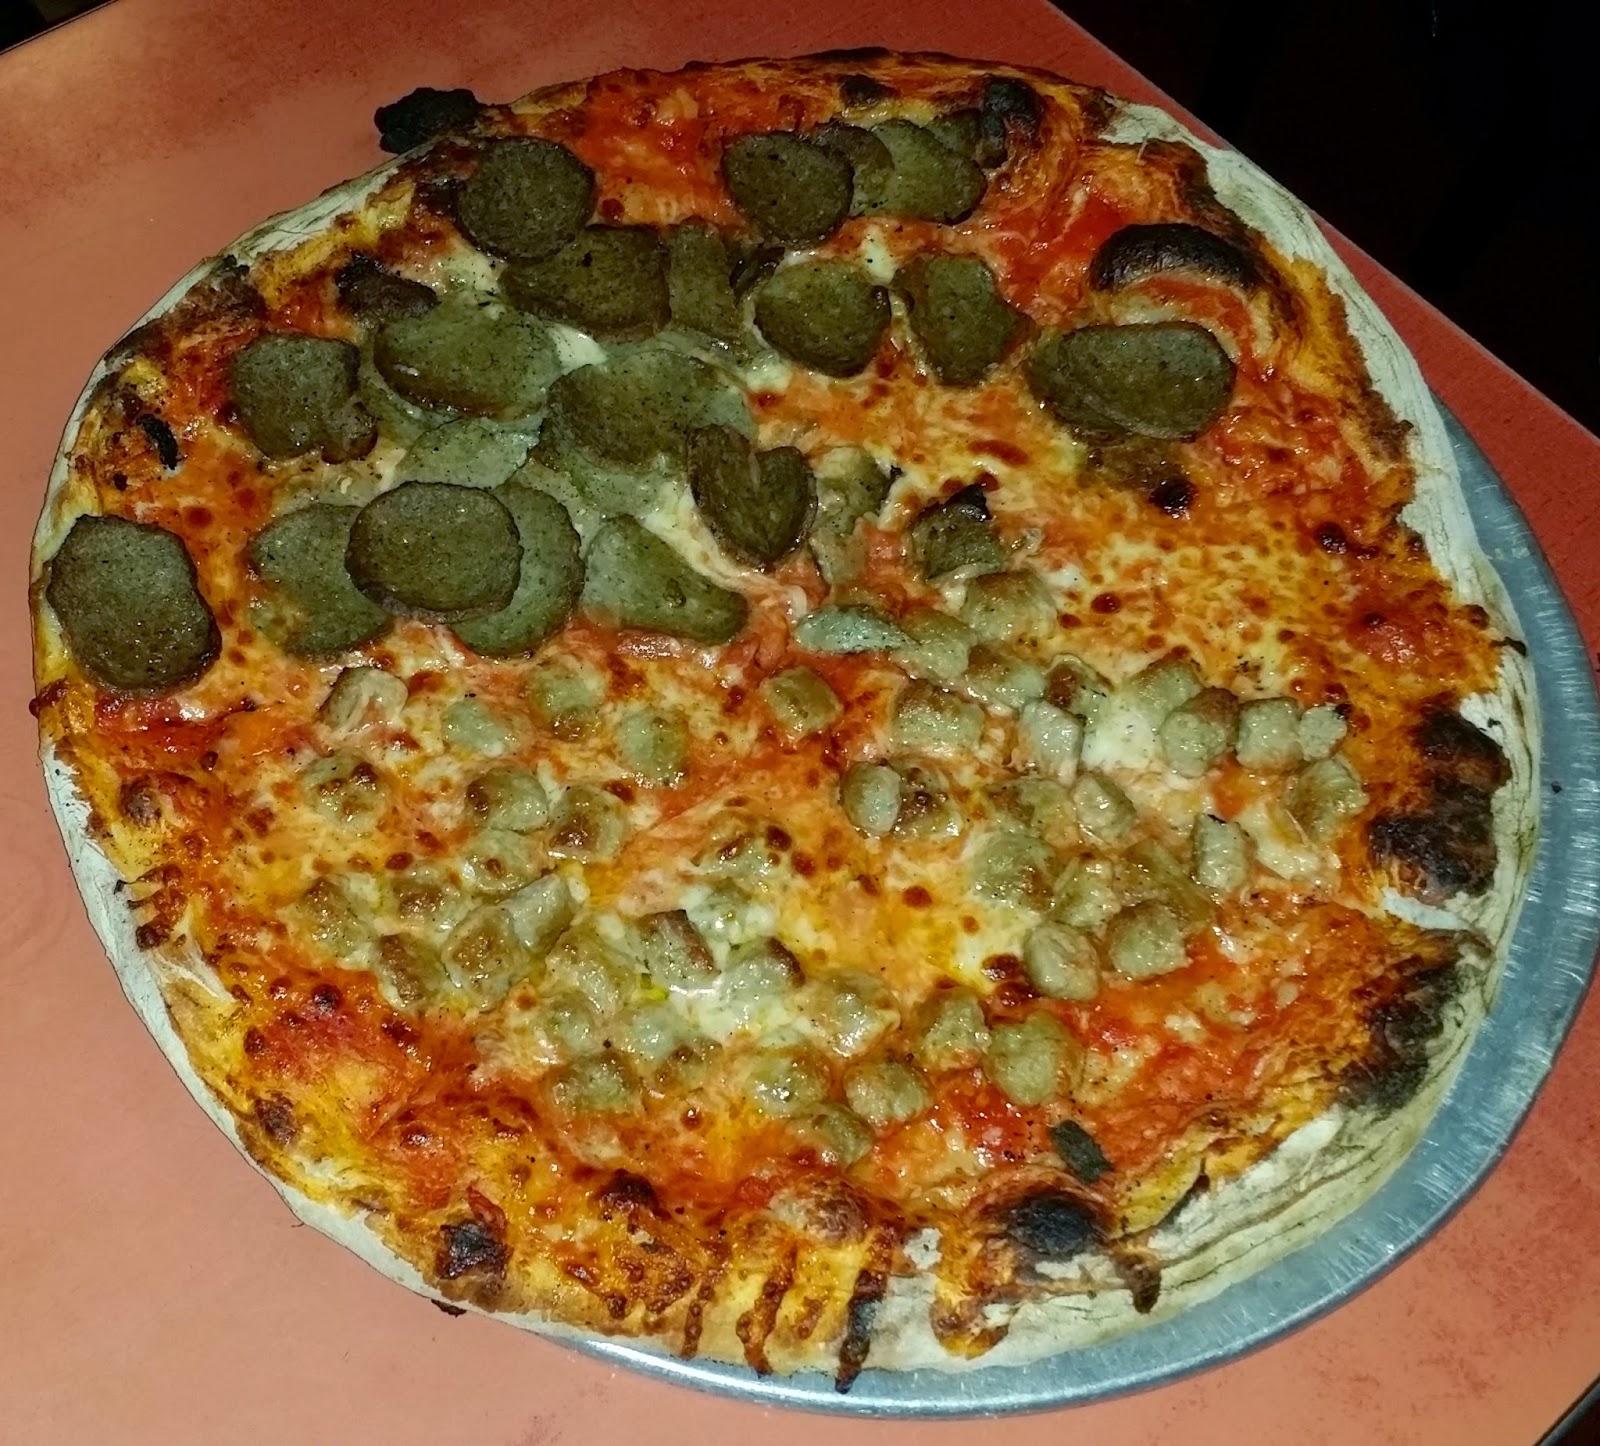 pizza quixote review regina pizza boston north end click any picture to see full size resolution